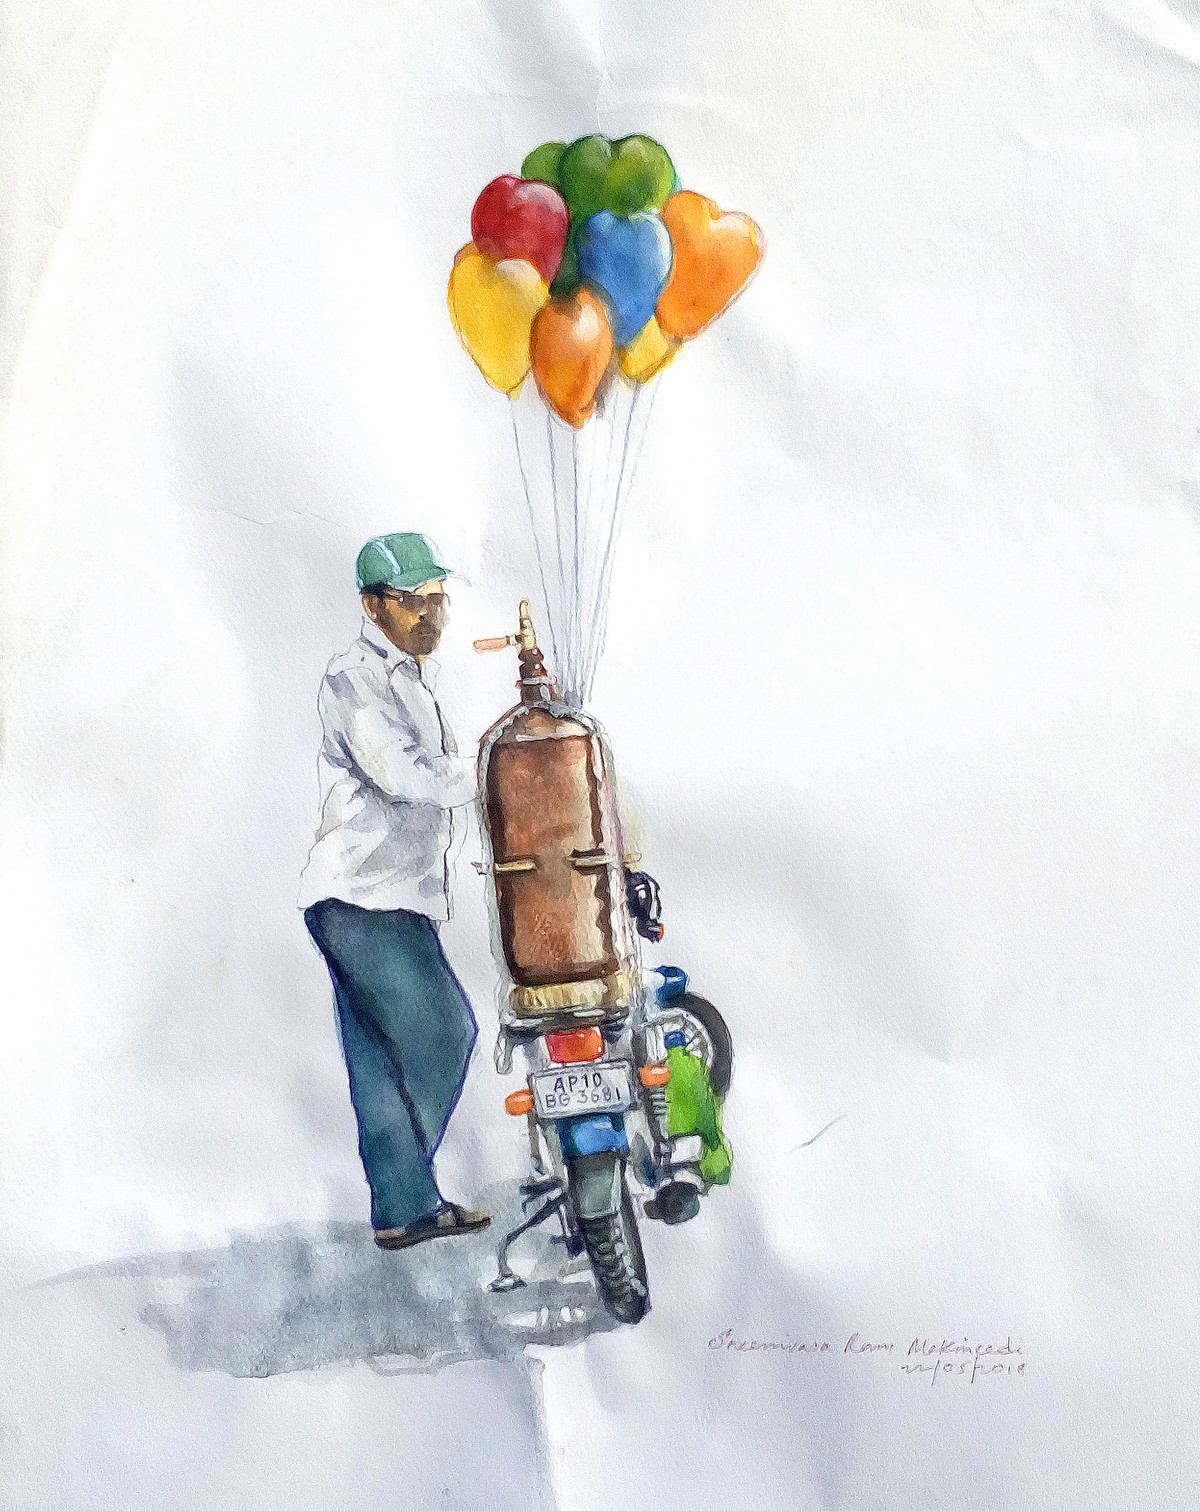 Balloon Man by Sreenivasa Ram Makineedi, Impressionism Painting, Watercolor on Paper, White color